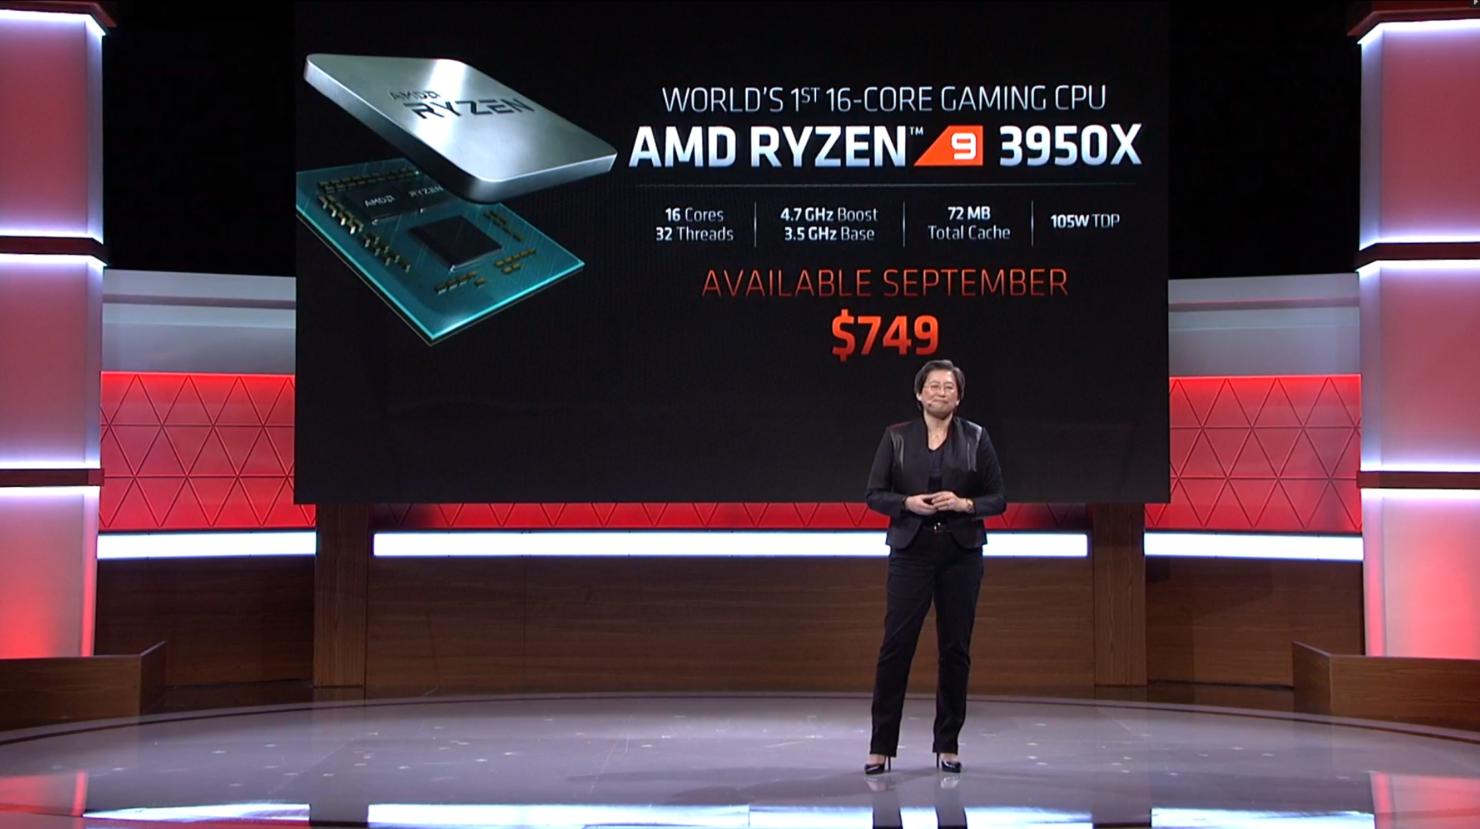 AMD-Ryzen-9-3950X-Processor-1480x829.png